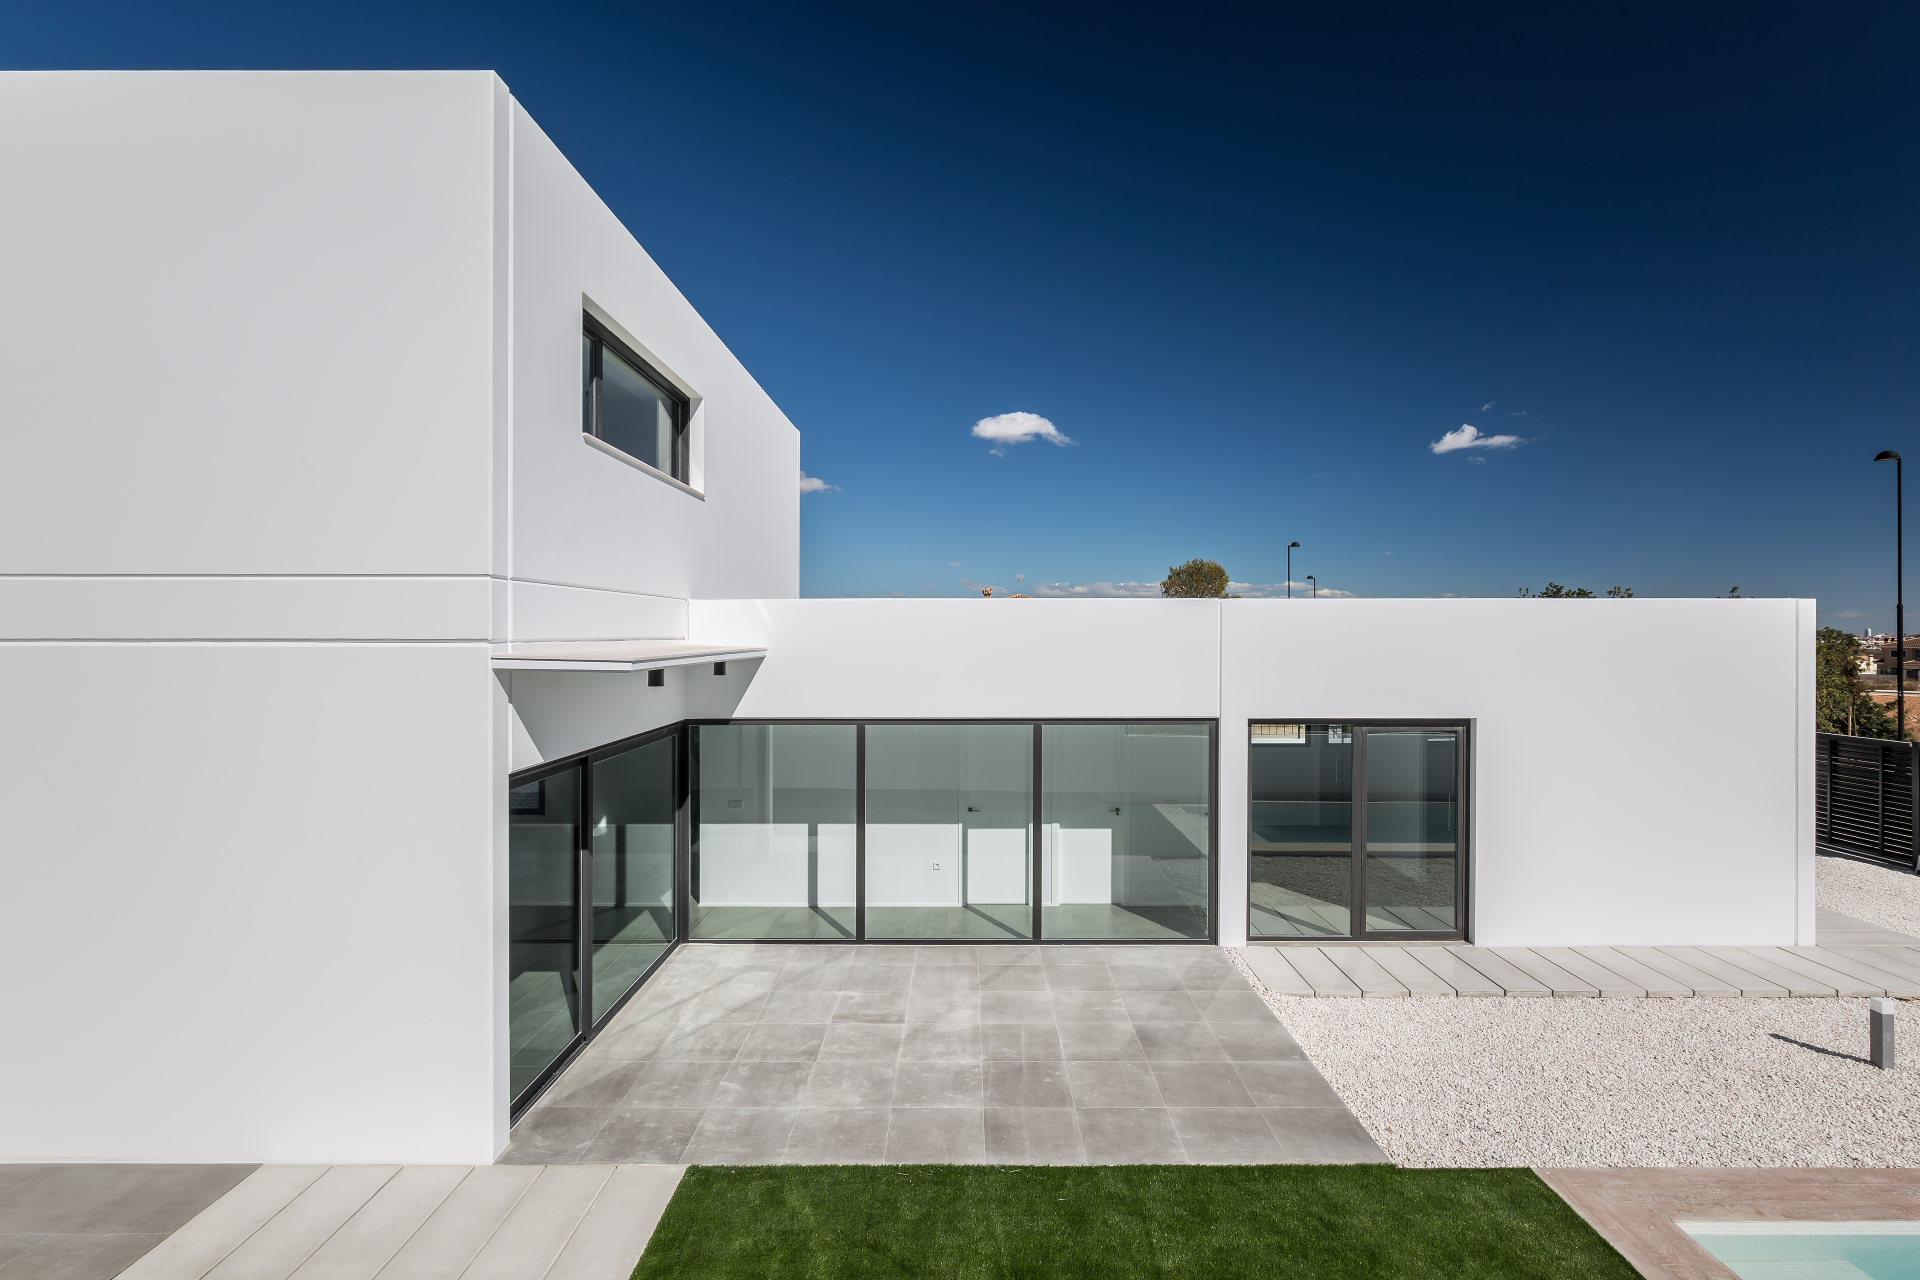 fotografia-arquitectura-valencia-german-cabo-viraje-el-vedat-torrent (6)